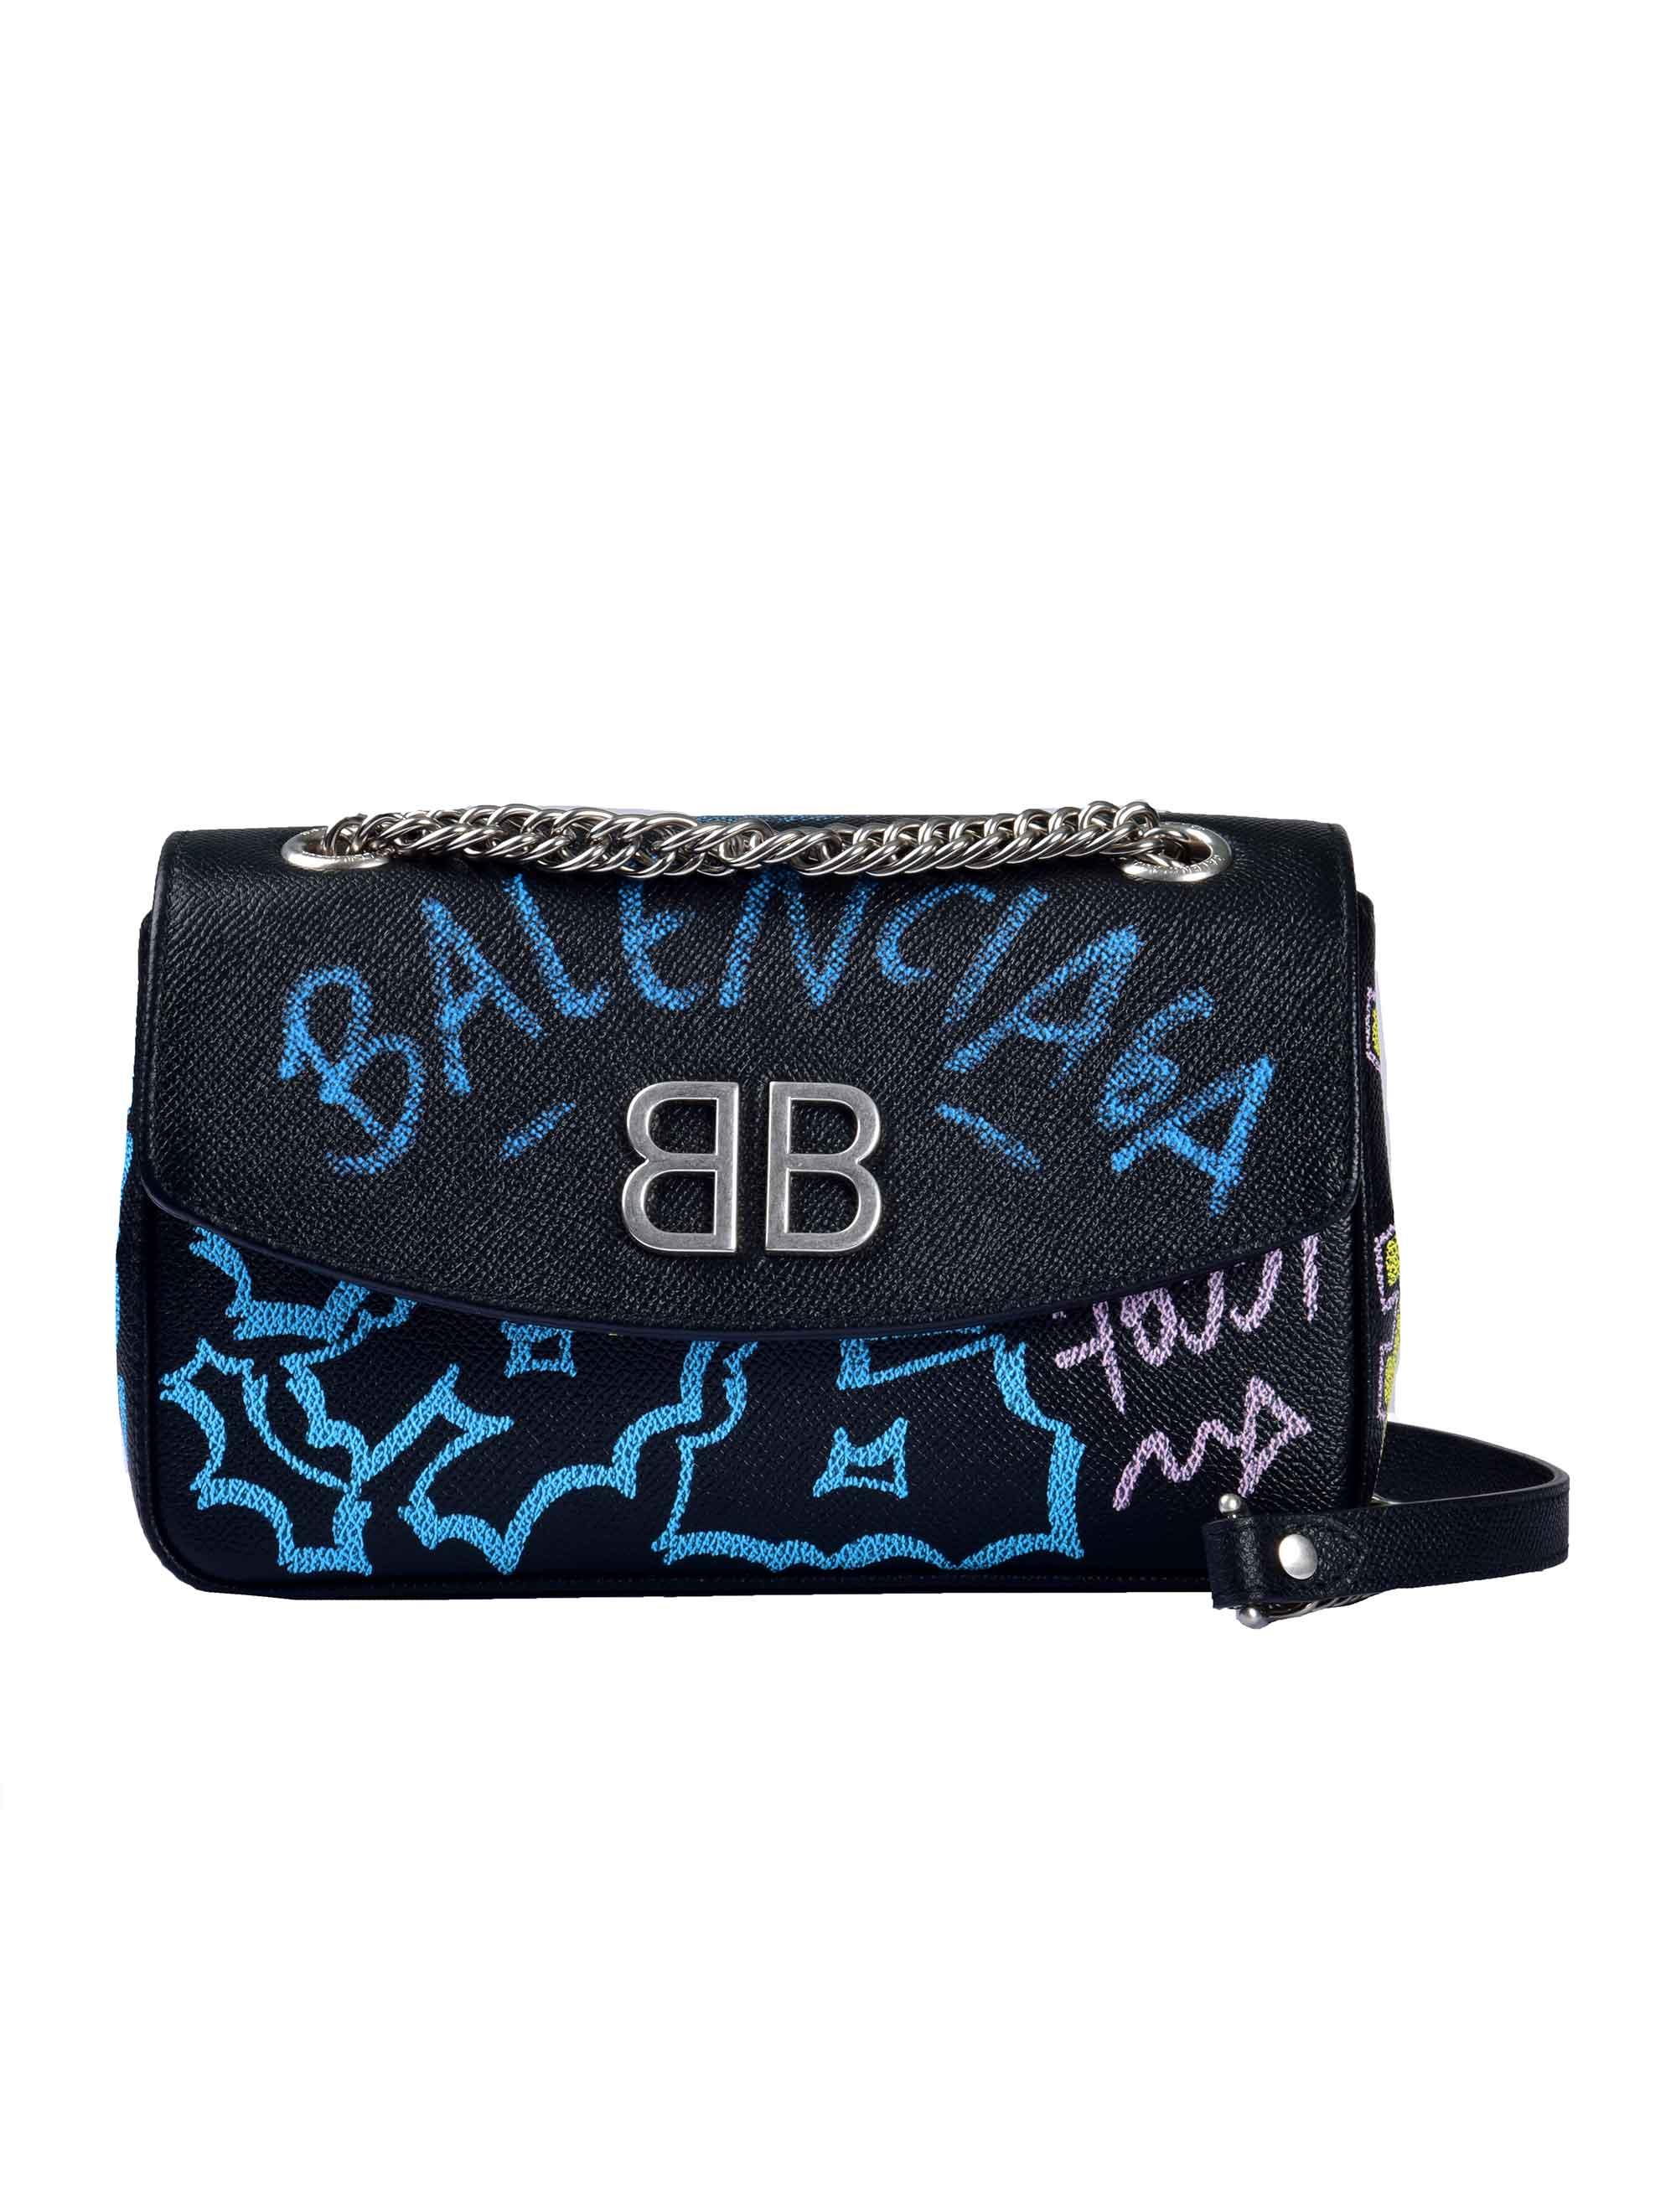 e778efac739748 Mimma Ninni – Luxury and Fashion Shopping. Balenciaga Bb Round S ...